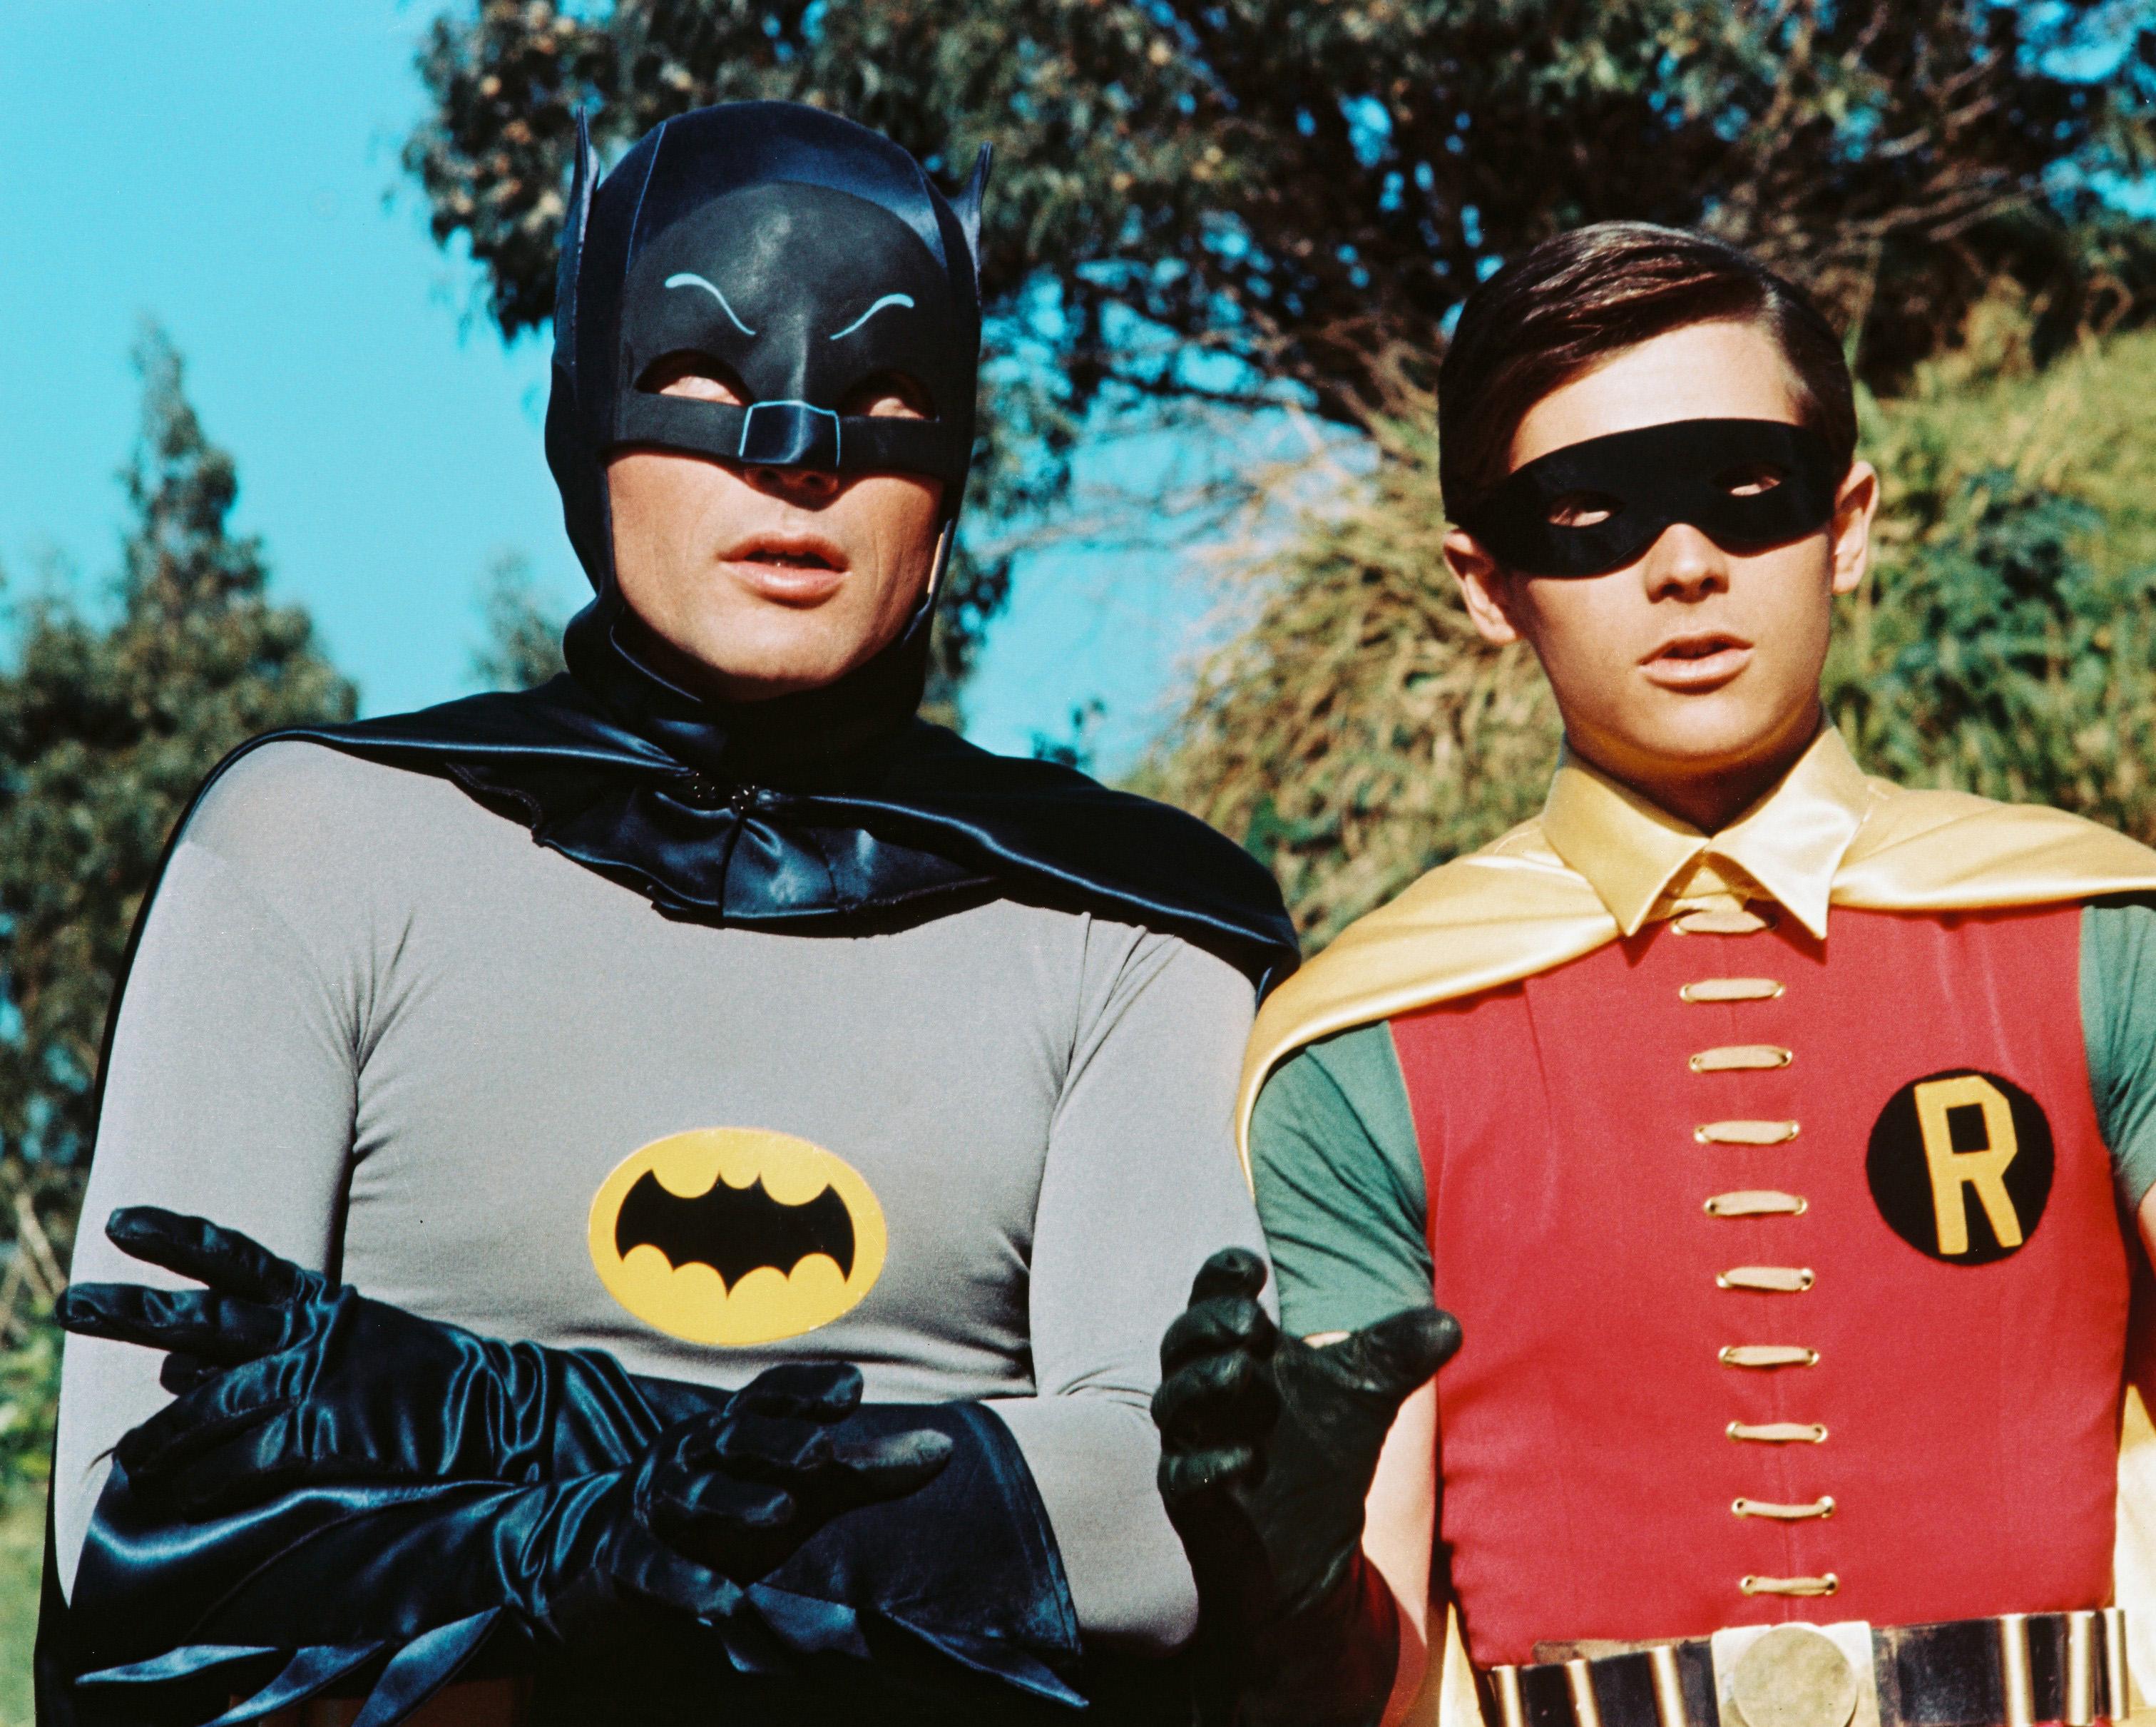 American actors Adam West as Bruce Wayne/Batman and Burt Ward as Dick Grayson/Robin in the TV series Batman, circa 1966